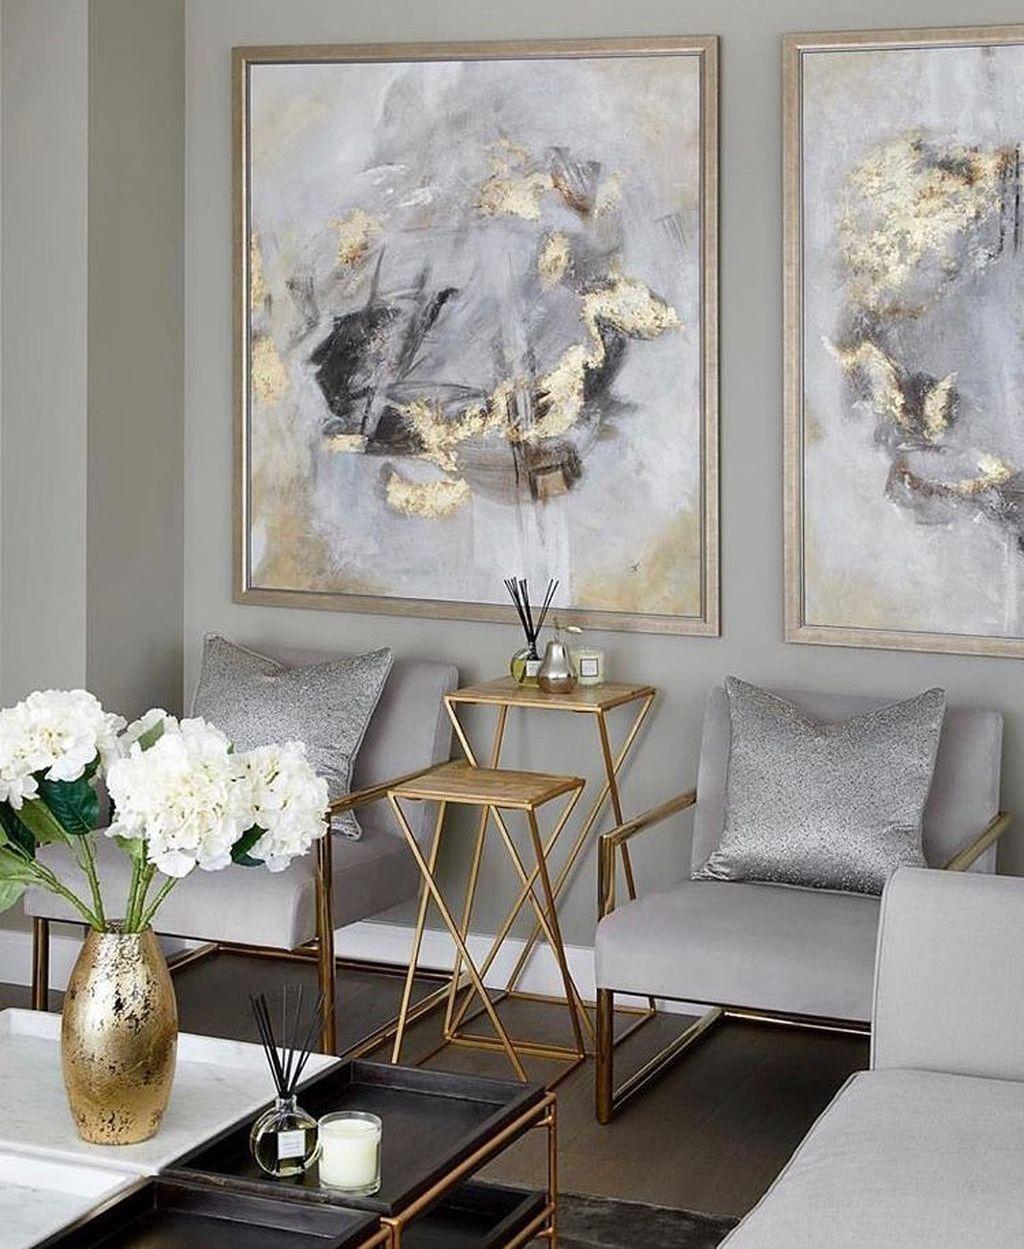 53 Inspirational Living Room Decor Ideas: 37 Fabulous Living Room Design Ideas To Copy Right Now